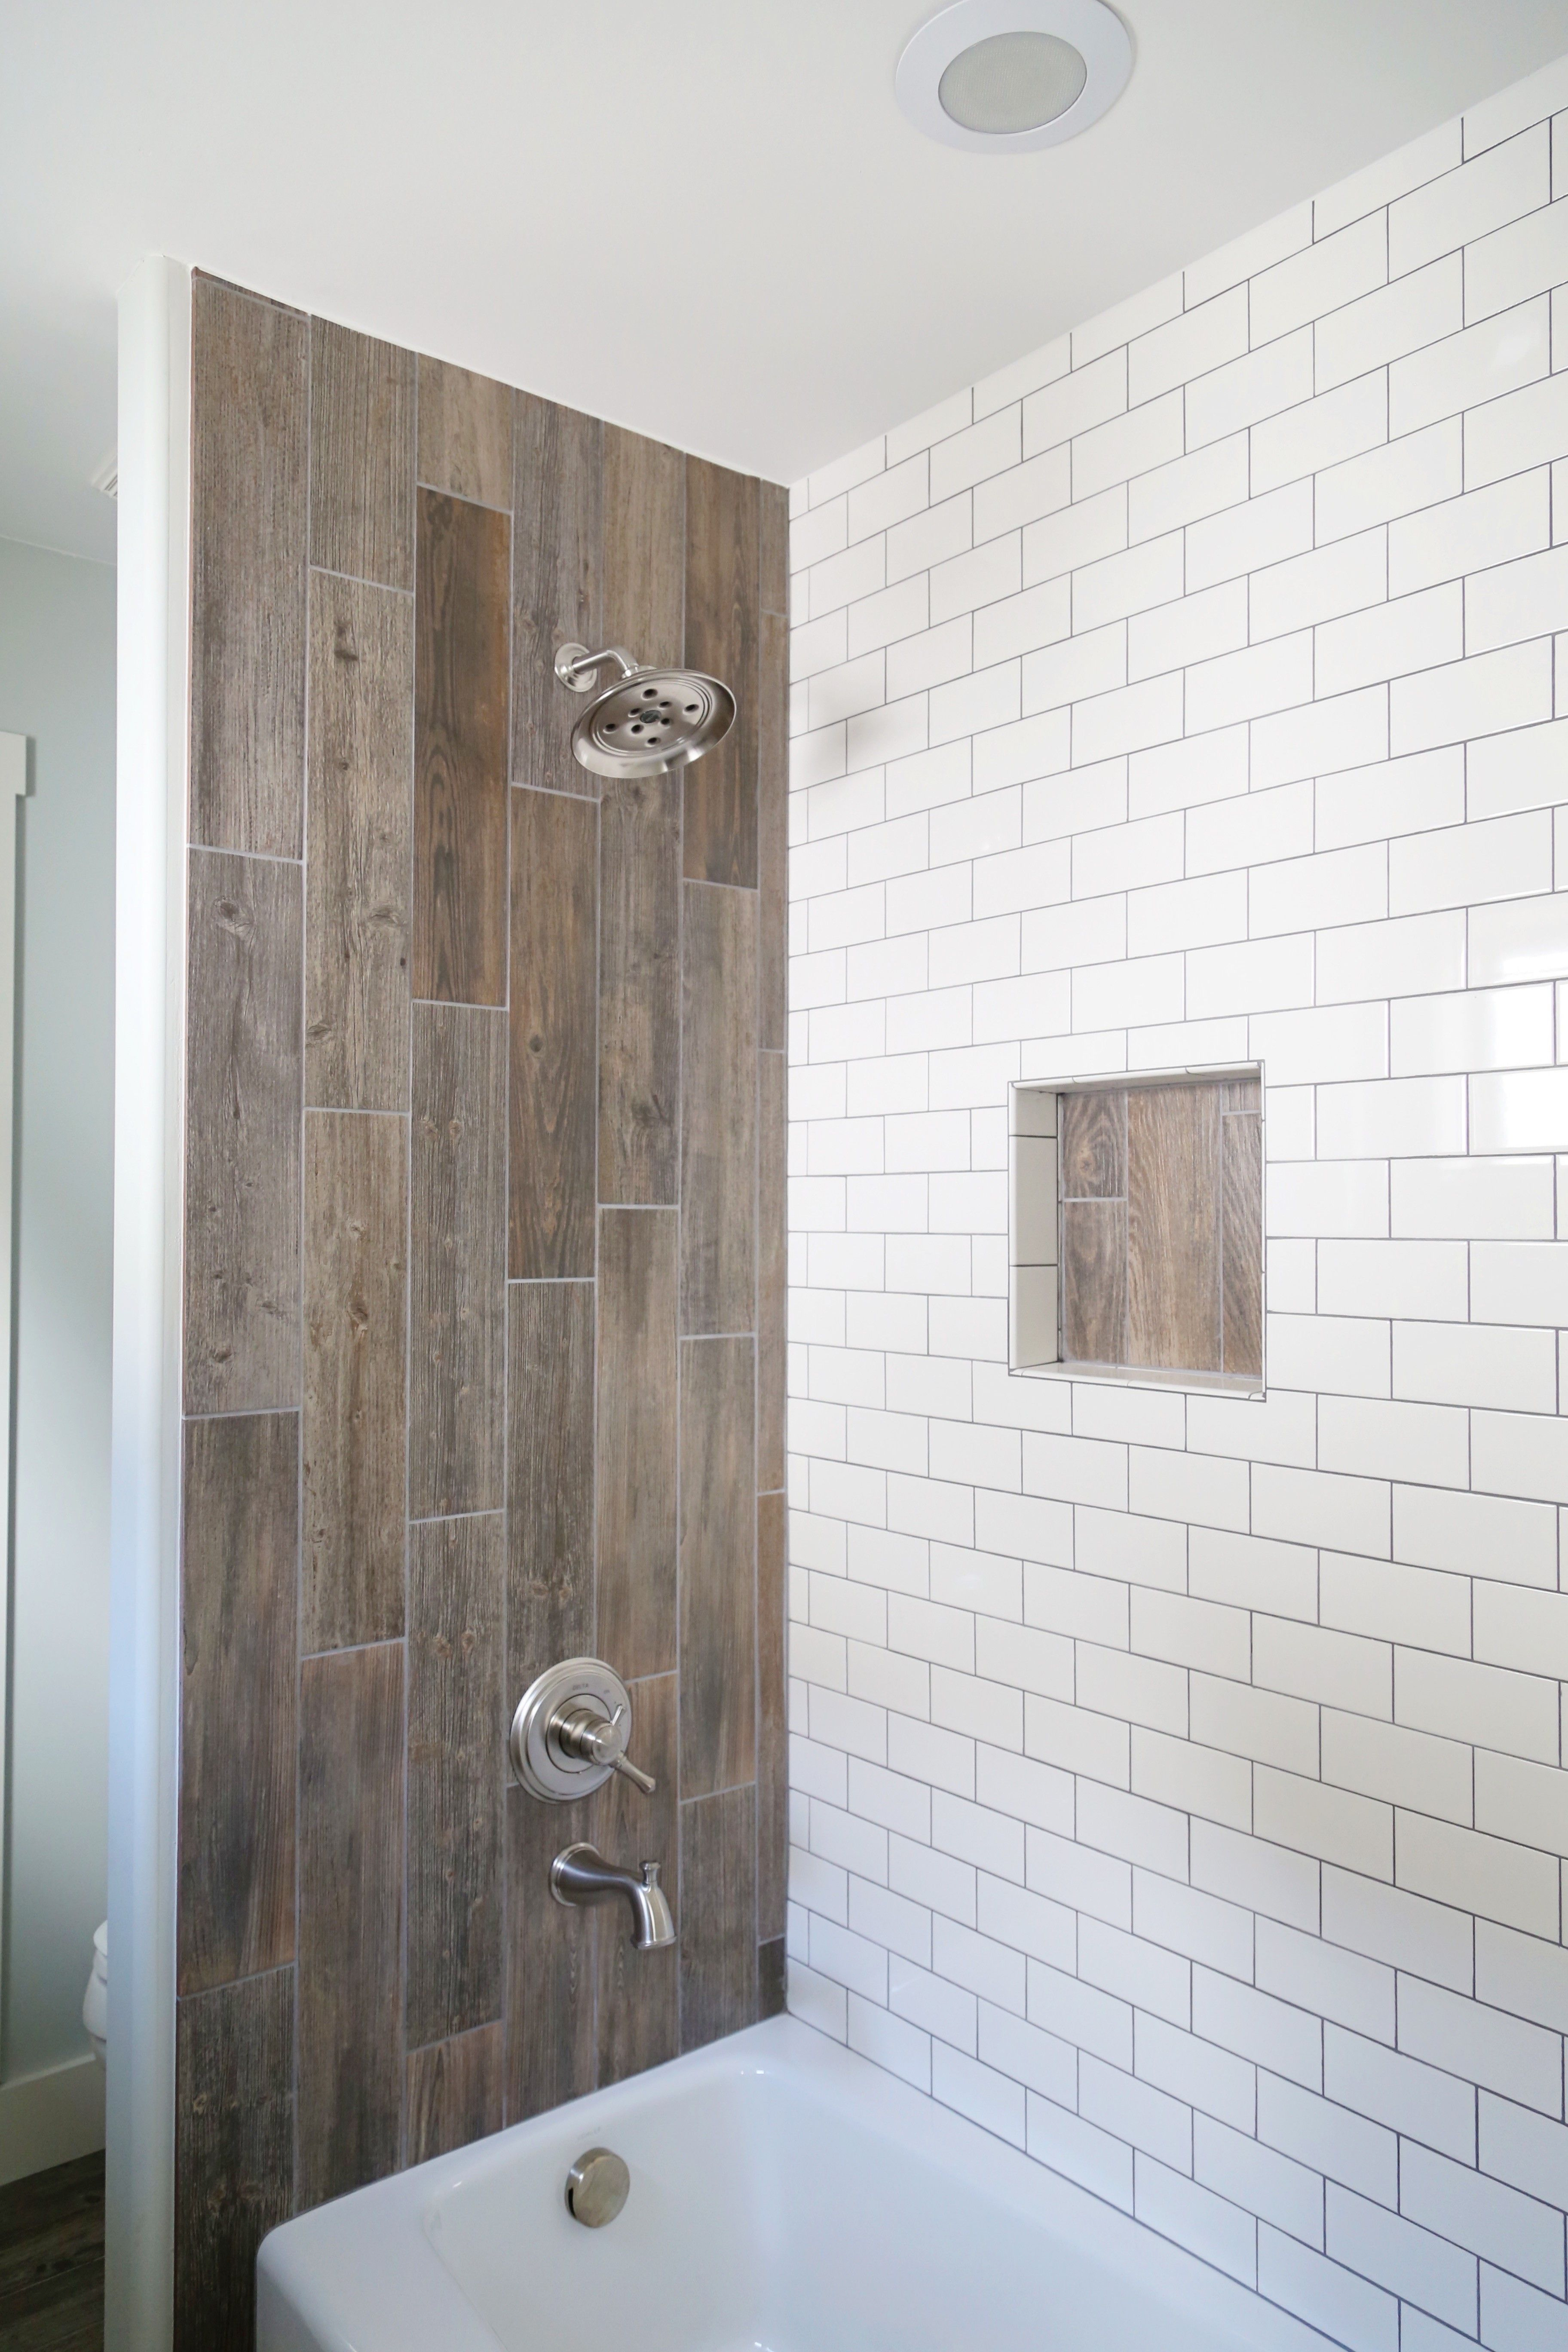 Jack And Jill Bathroom Renovation Using Yellow Duk For Easy Shower Wall Insert Wood Grain Meets Tiling Clean Farmhouse Shower Wood Tile Shower Shower Tile